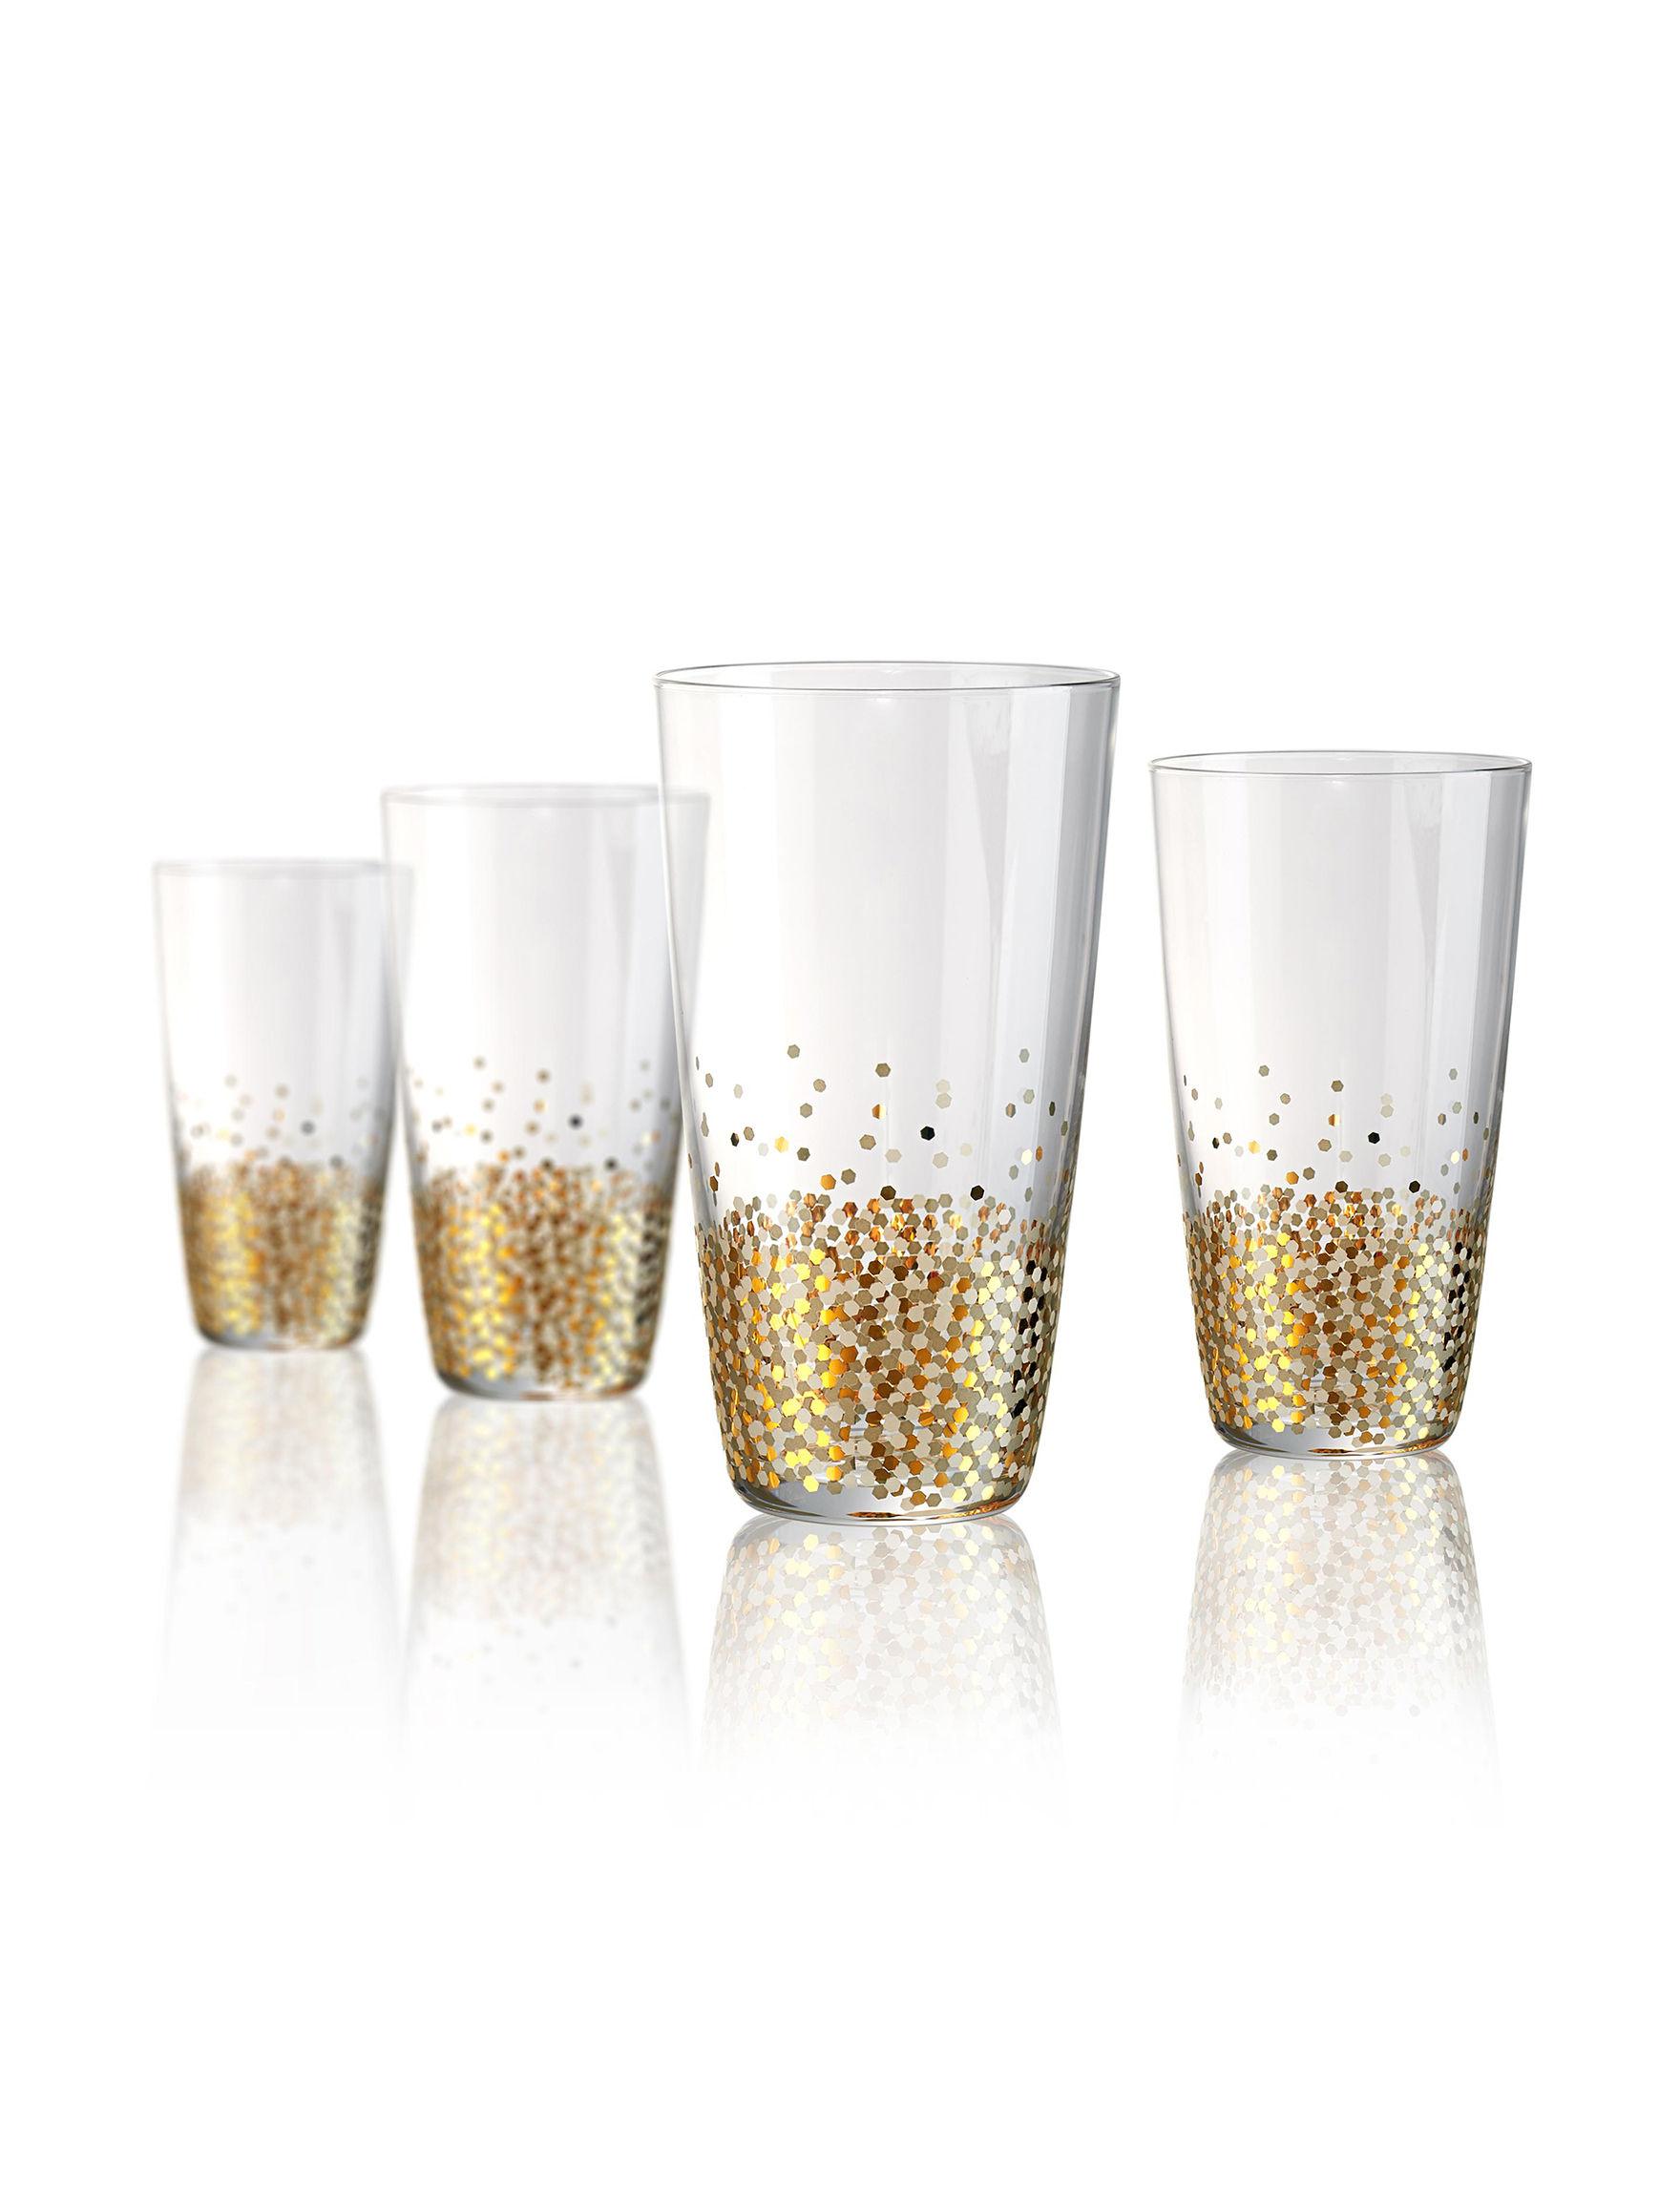 Artland Gold Drinkware Sets Drinkware